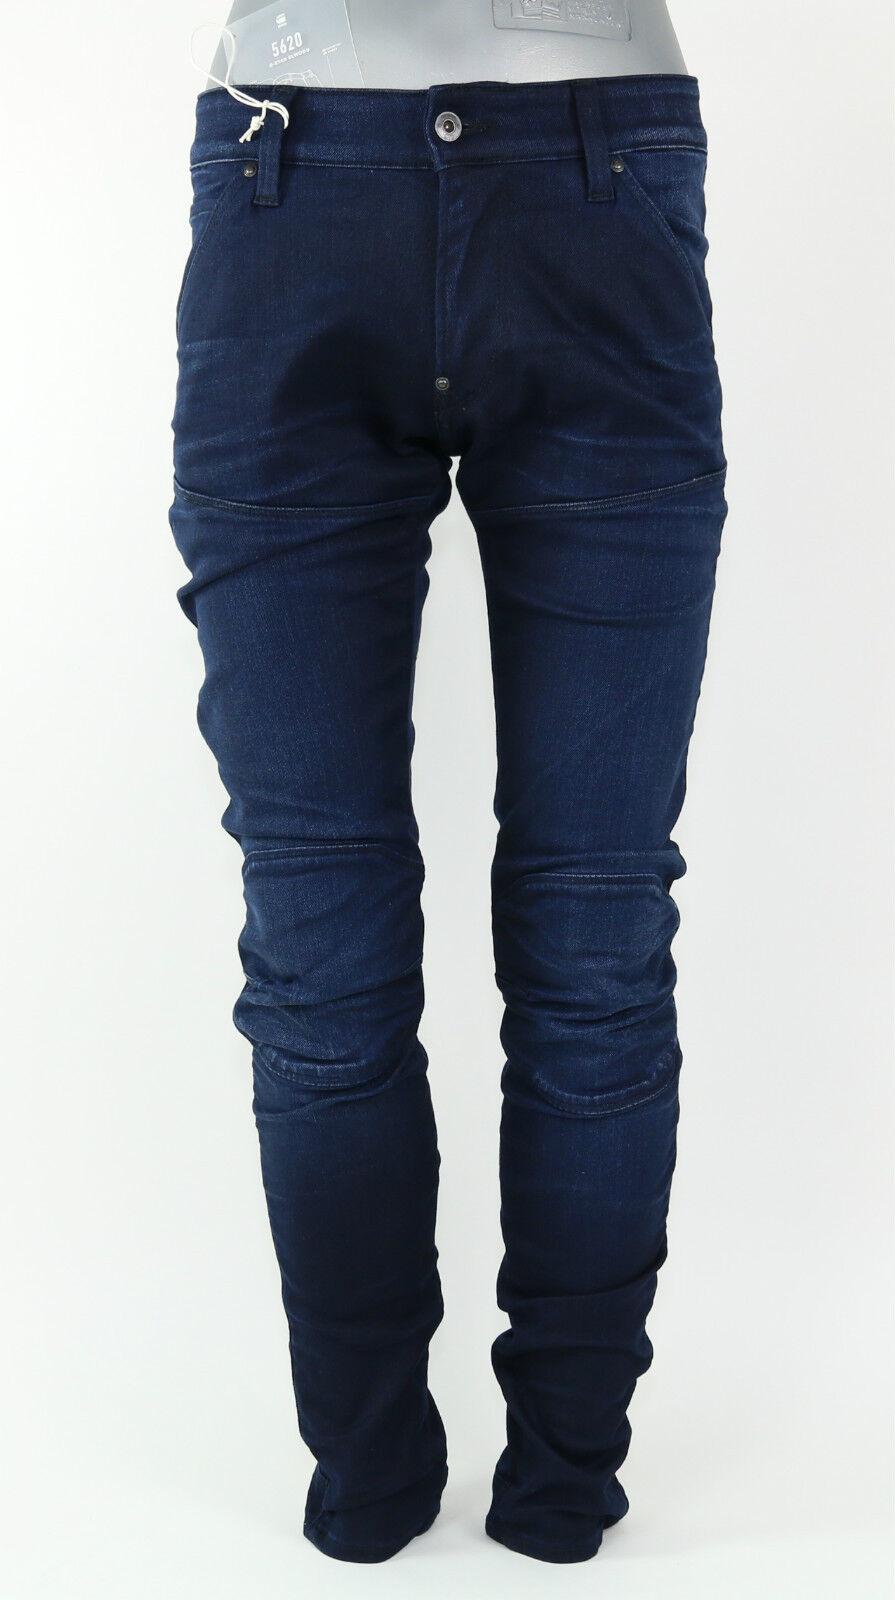 G Star Jeans 5620 3D Super Slim - 51026.6590.89 - DK Aged - Dark bluee +NEW+